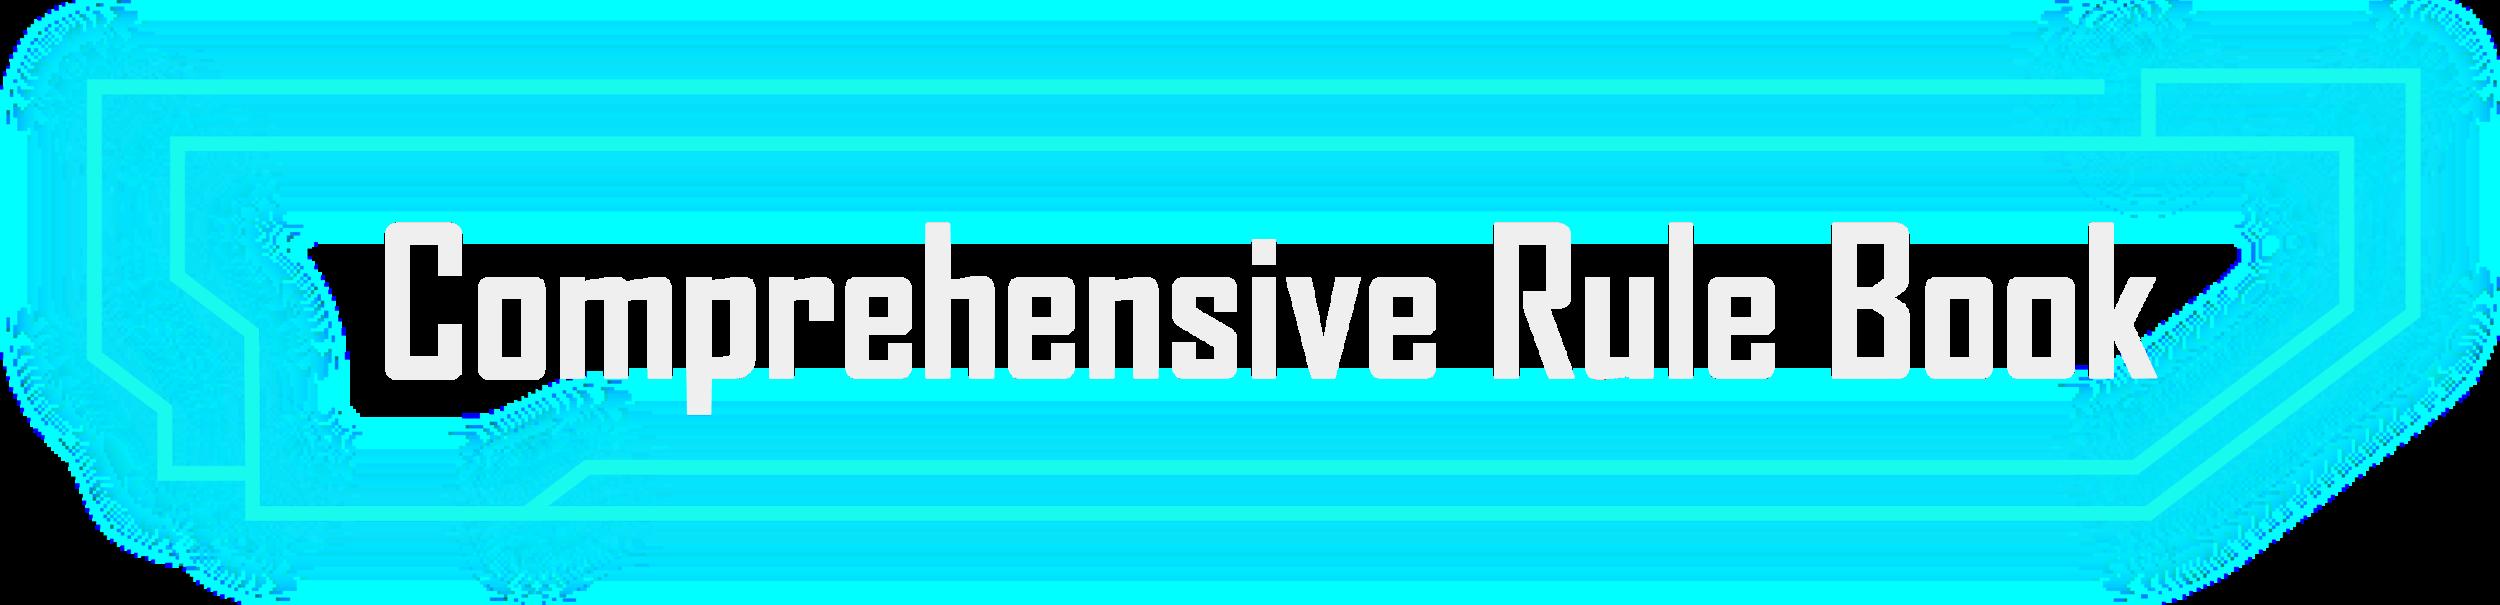 Comprehensive Rulebook-06.png